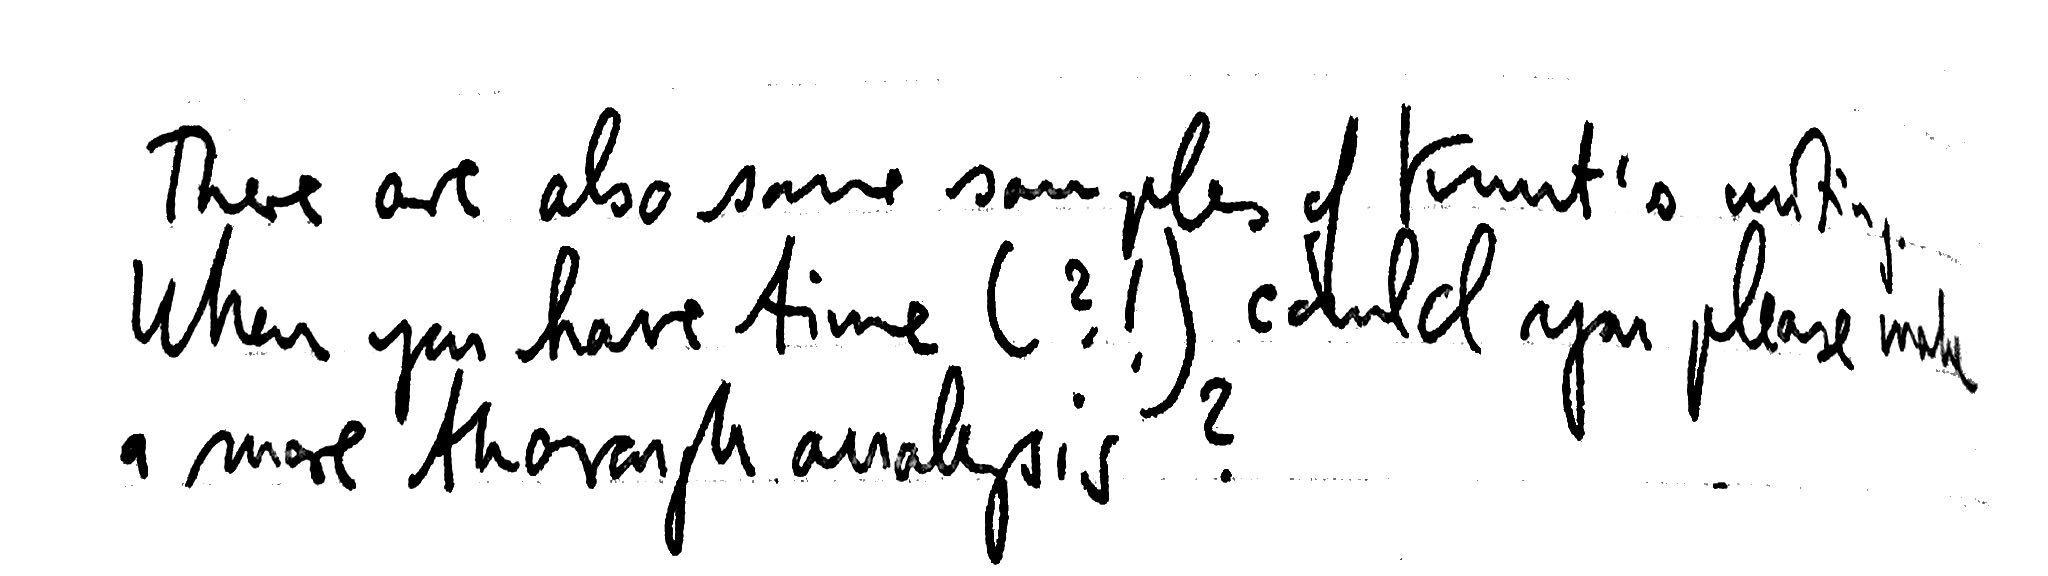 irritation in handwriting